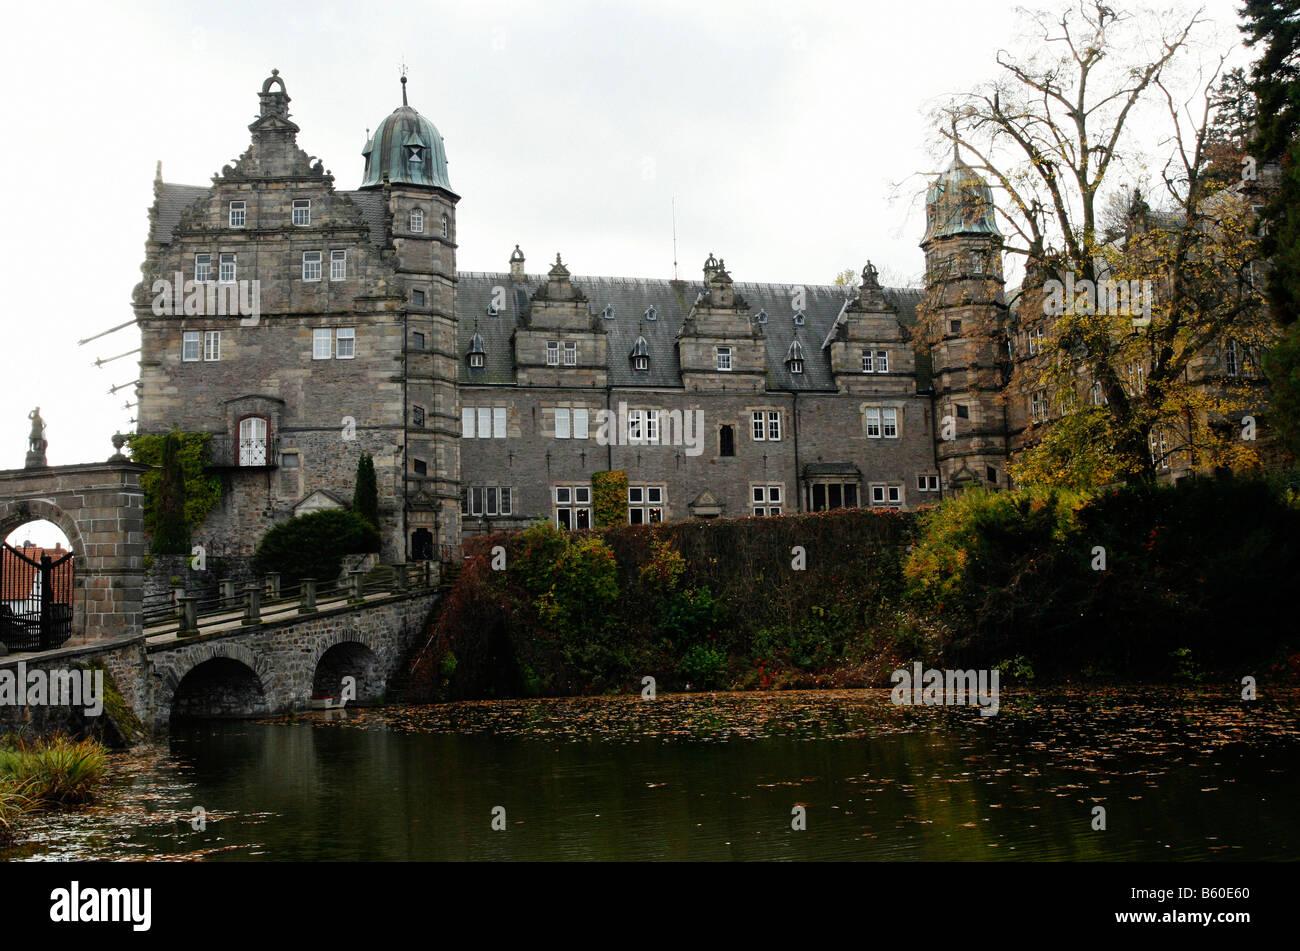 Haemelschenburg castle, Lower Saxony, Germany Stock Photo